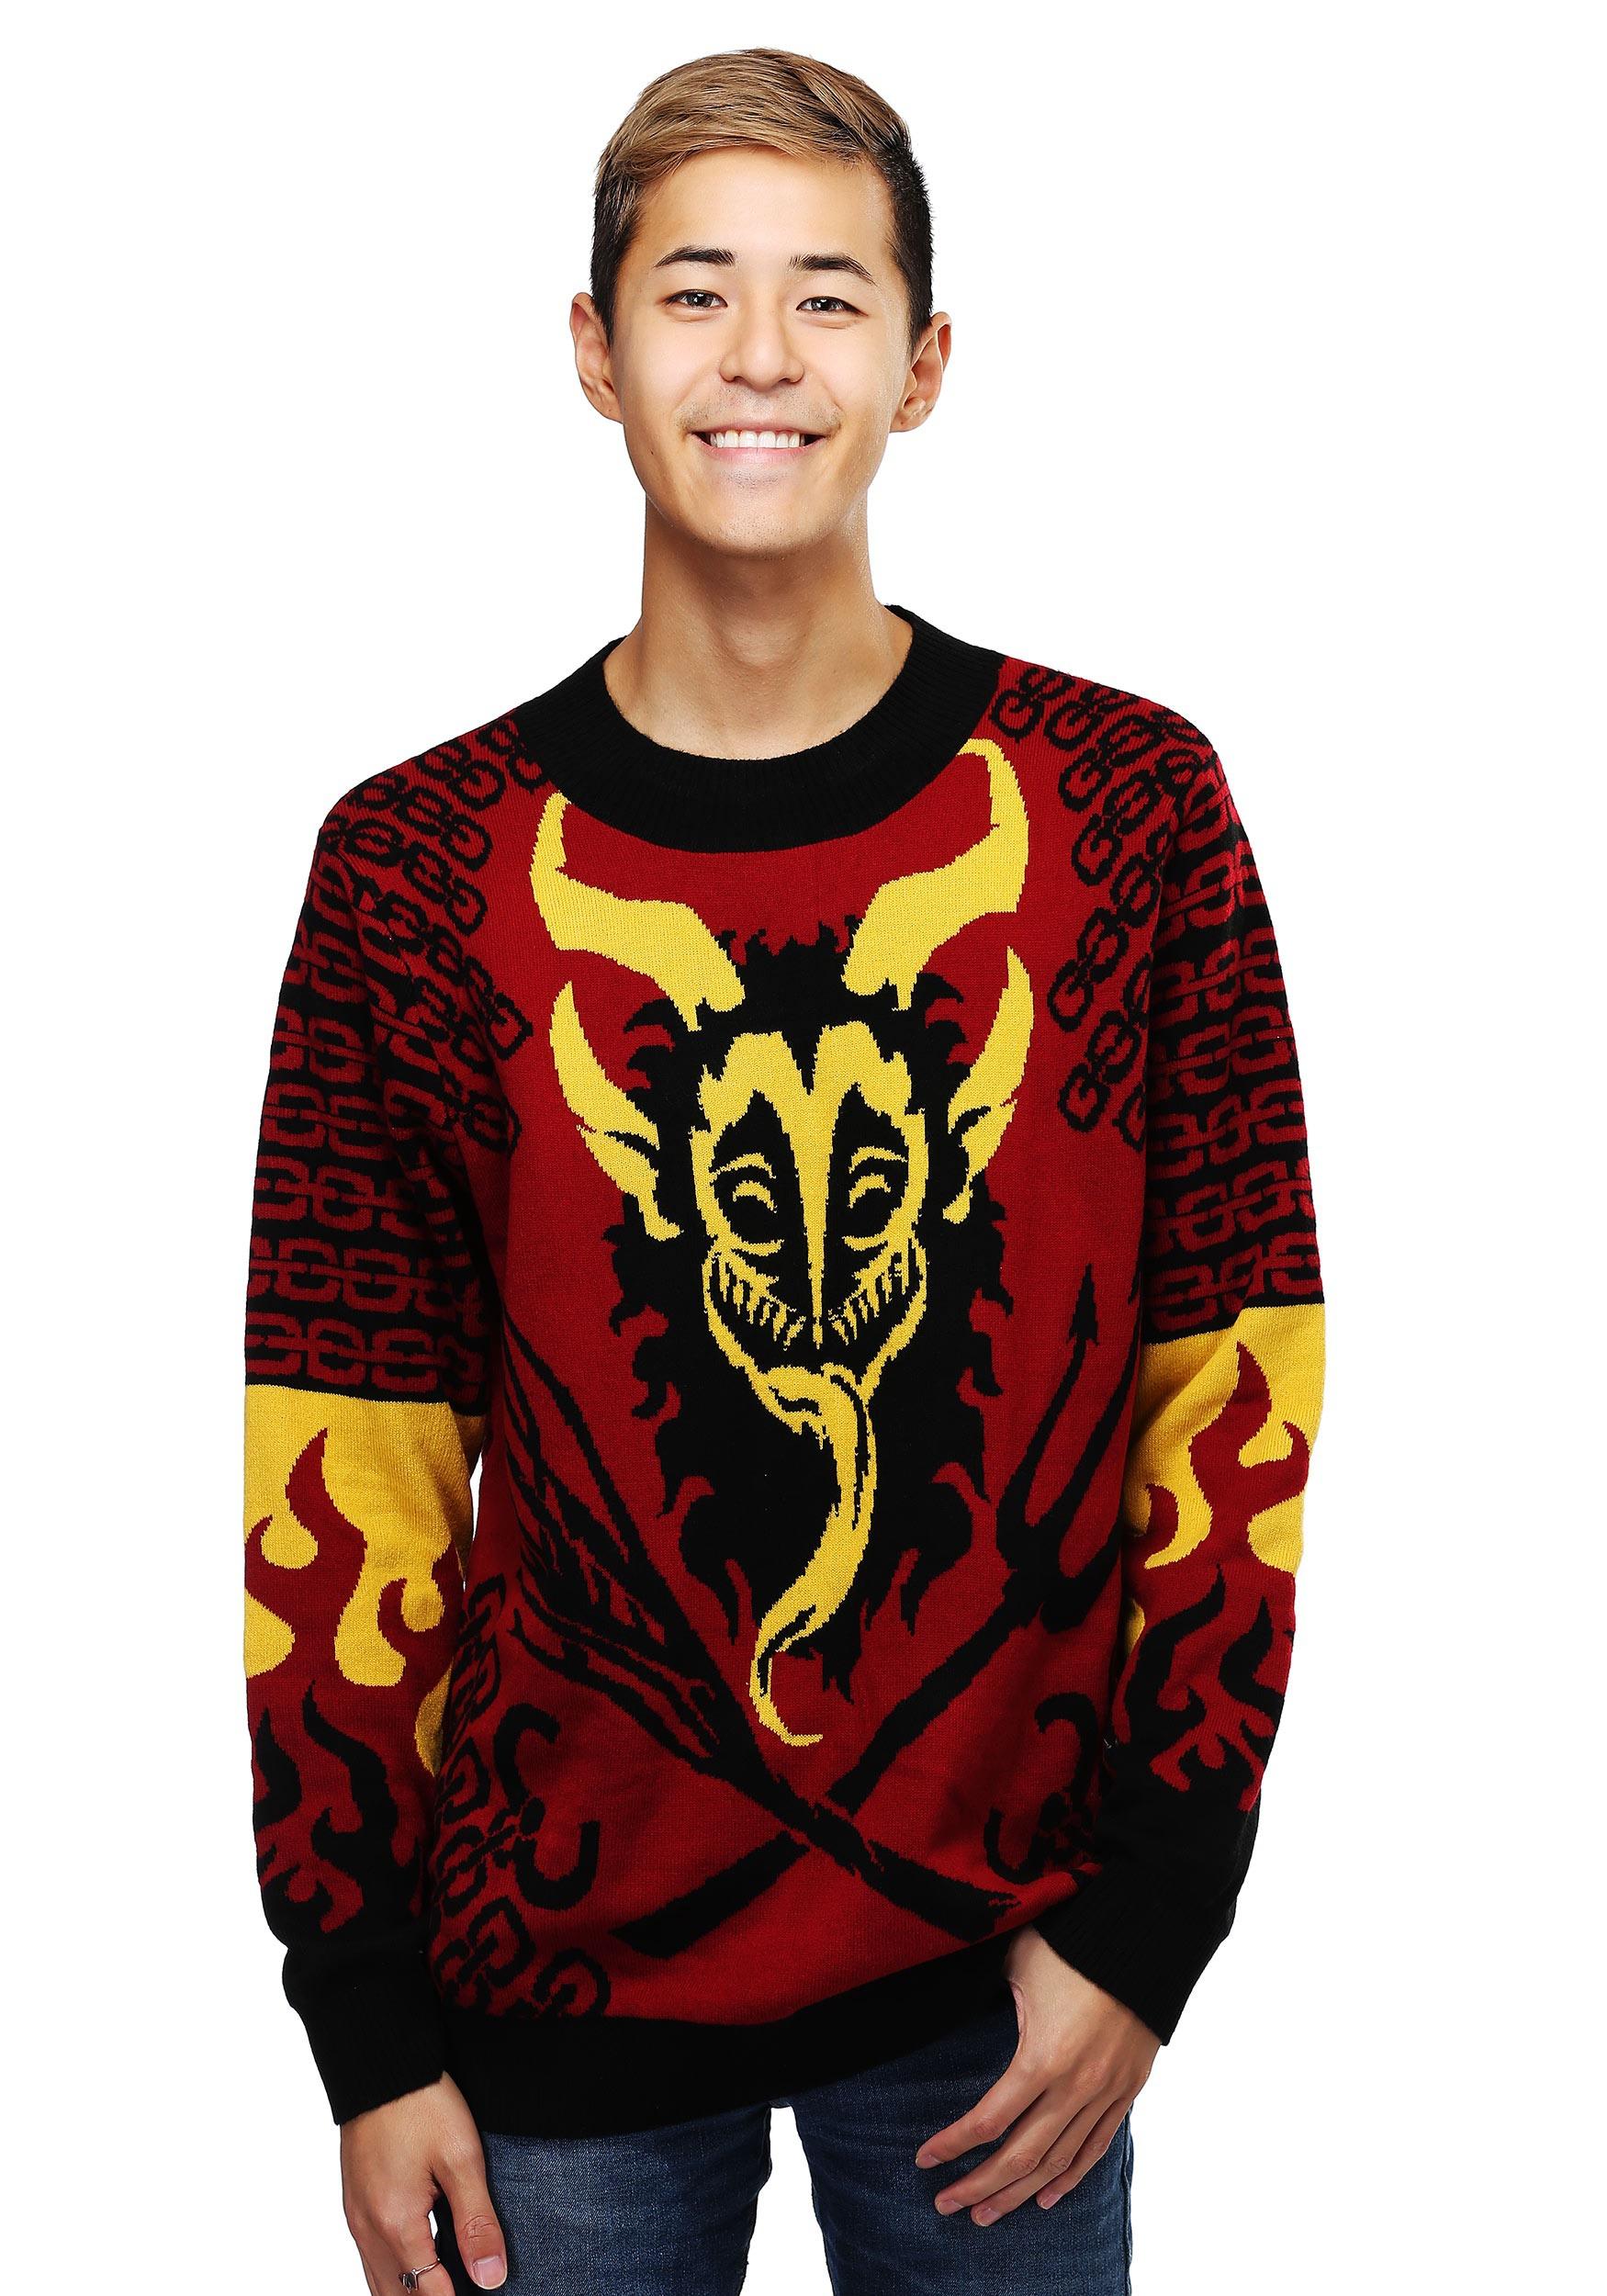 Krampus Ugly Christmas Sweater for Men